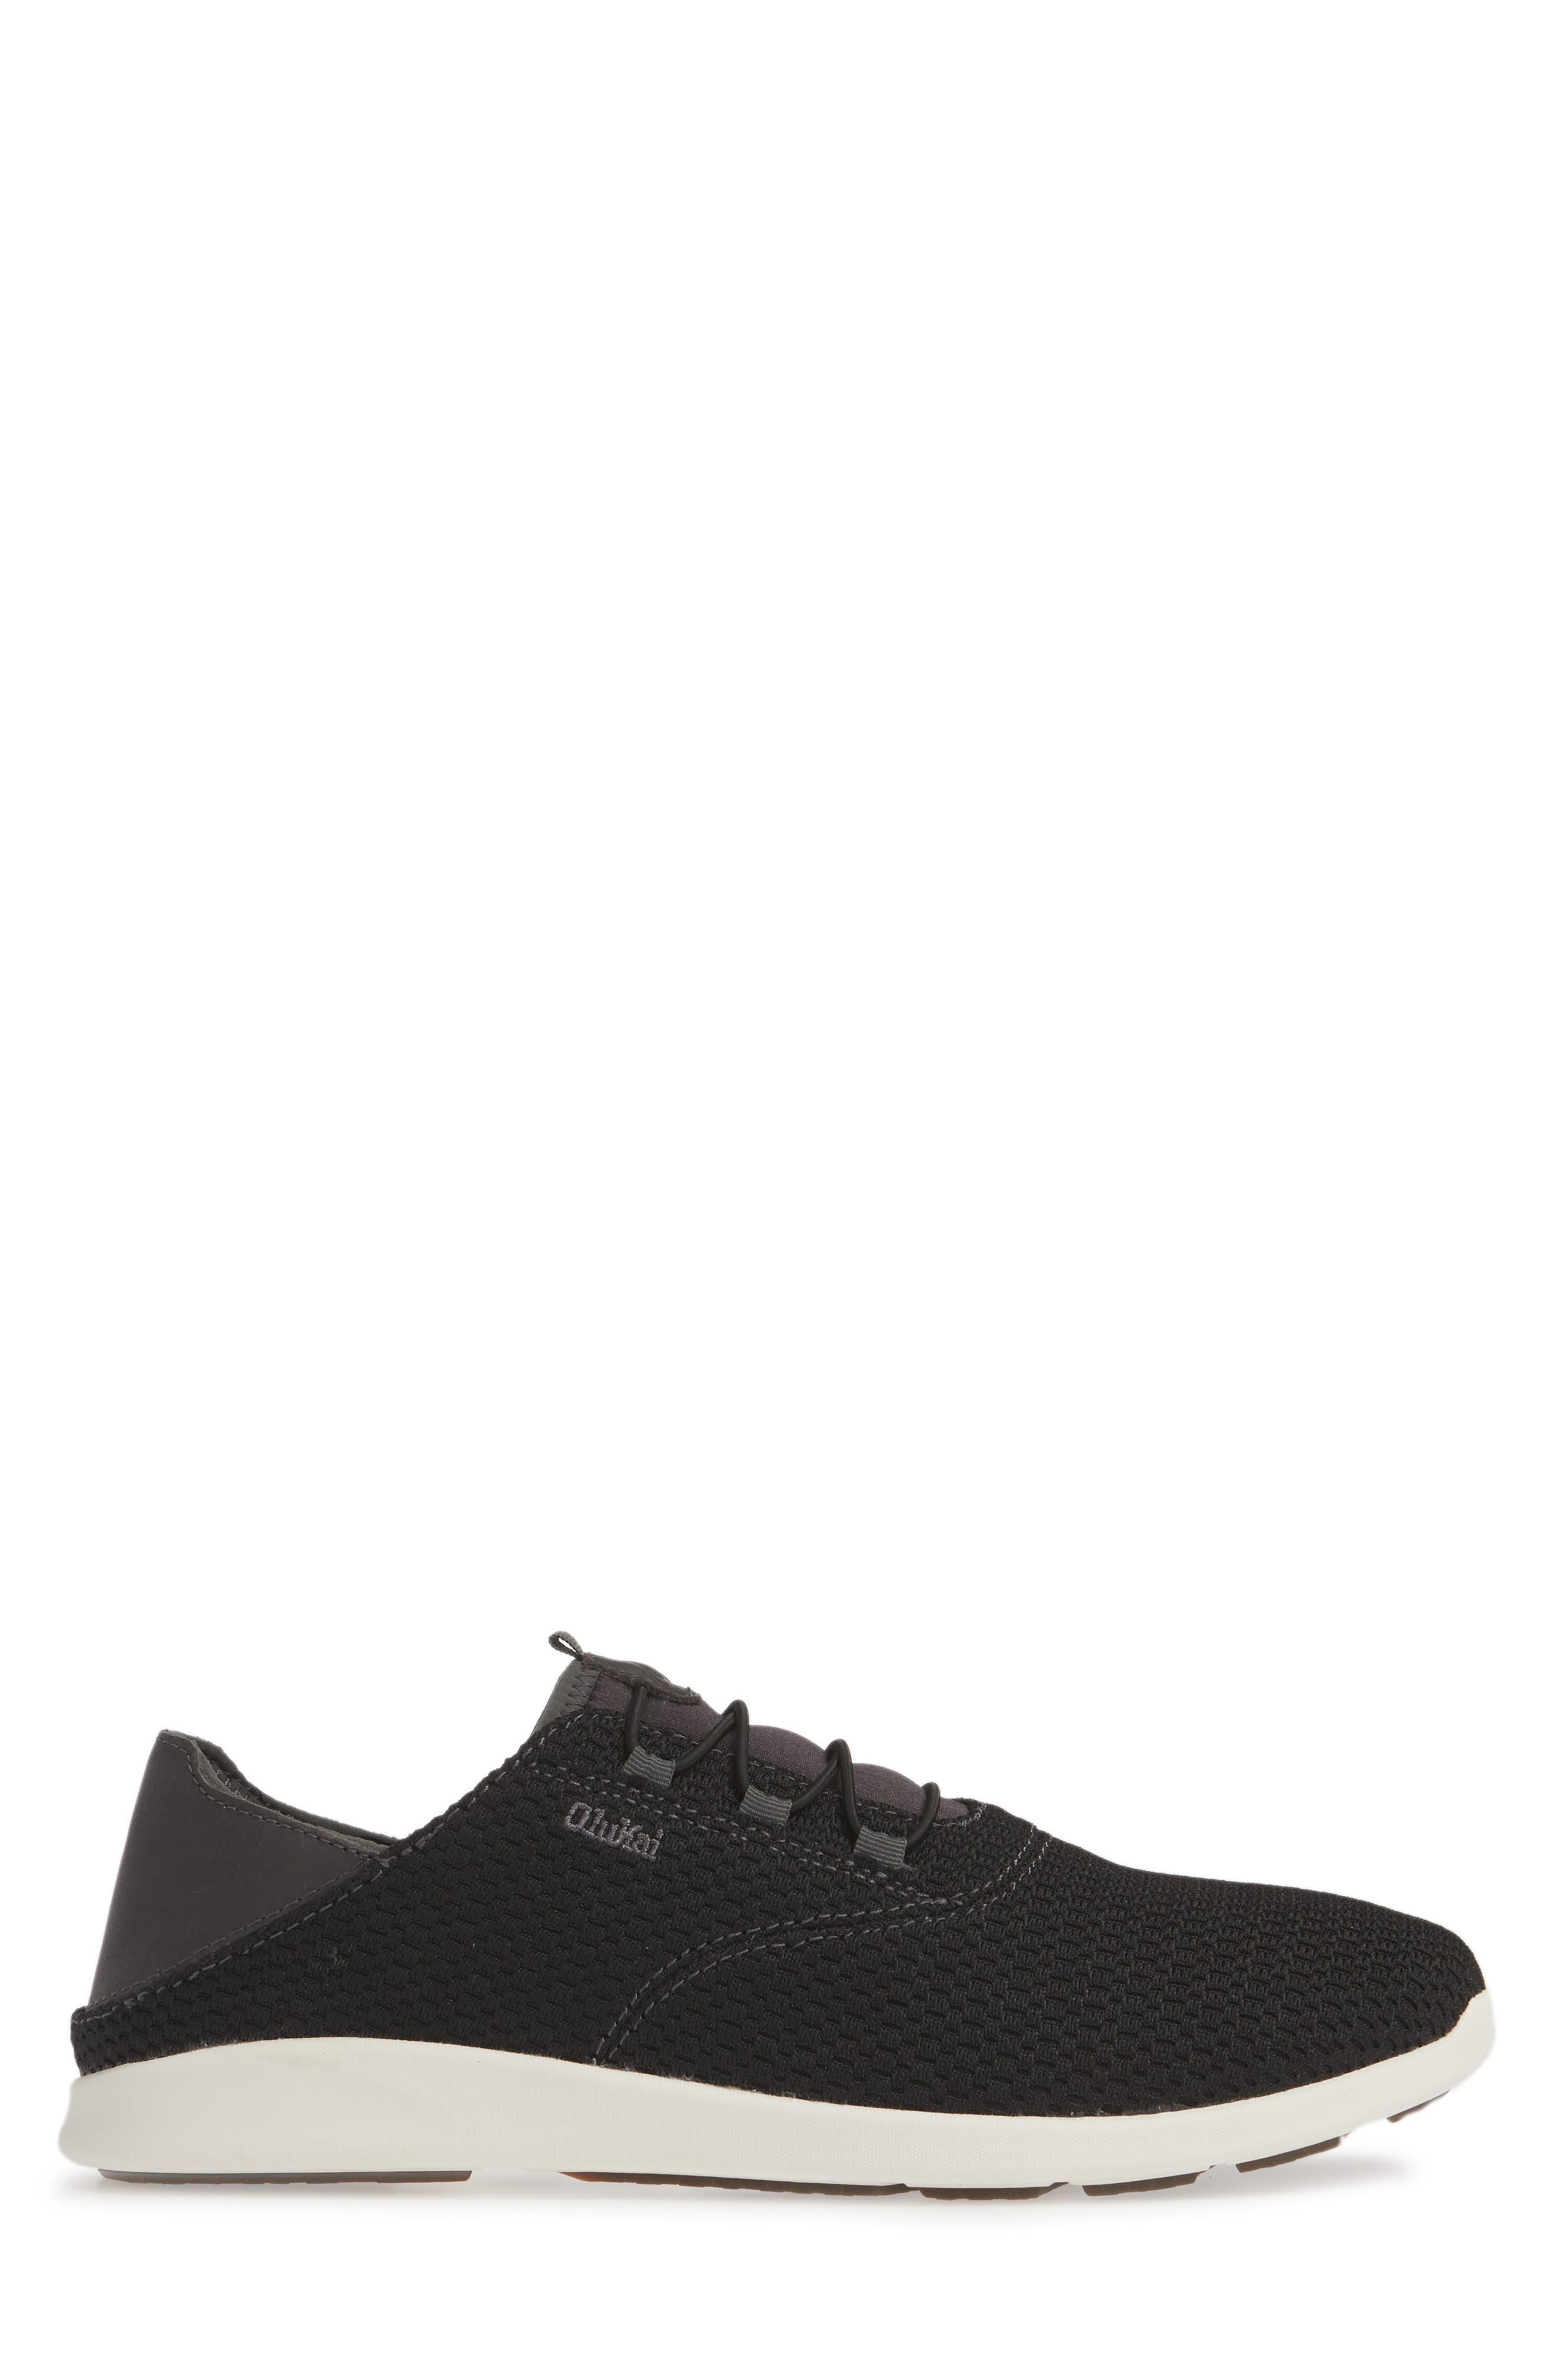 OLUKAI, Alapa Li Sneaker, Alternate thumbnail 2, color, BLACK/ DARK SHADOW MESH